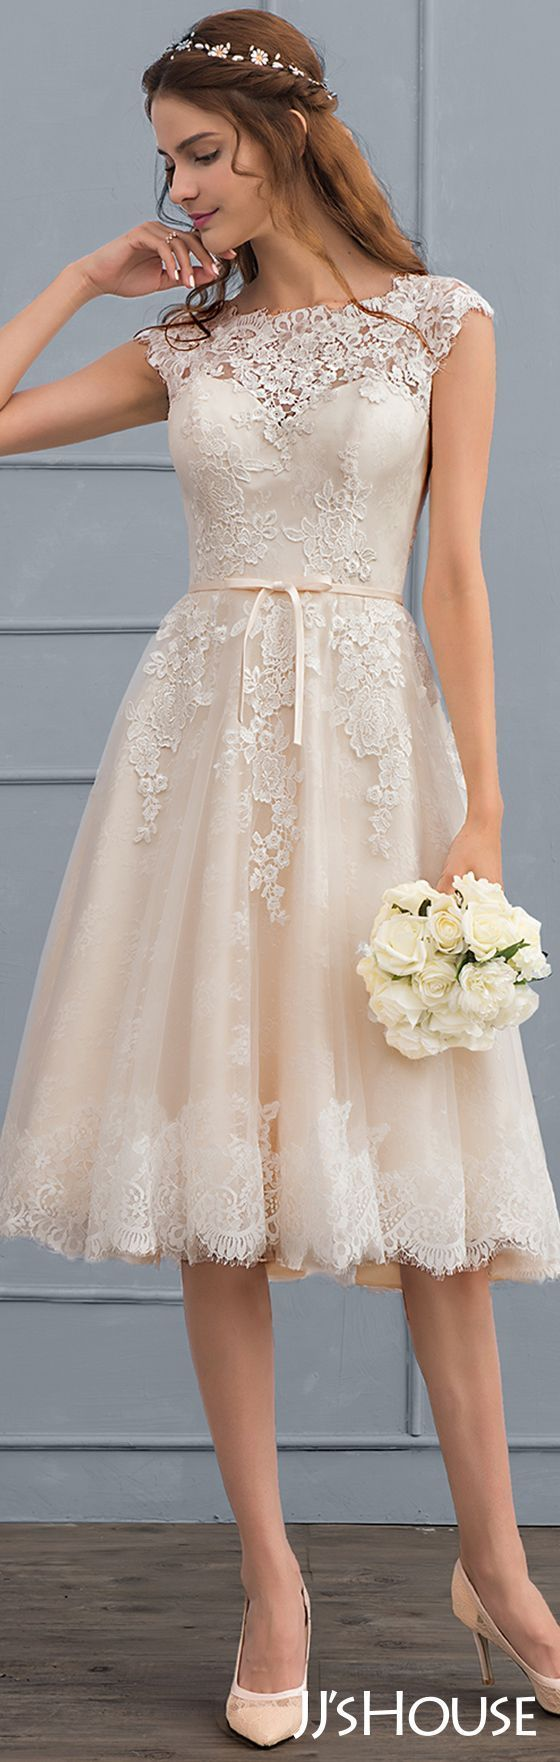 JJsHouse #wedding #wedding #jjshouse #jjshouse #wedding #wedding